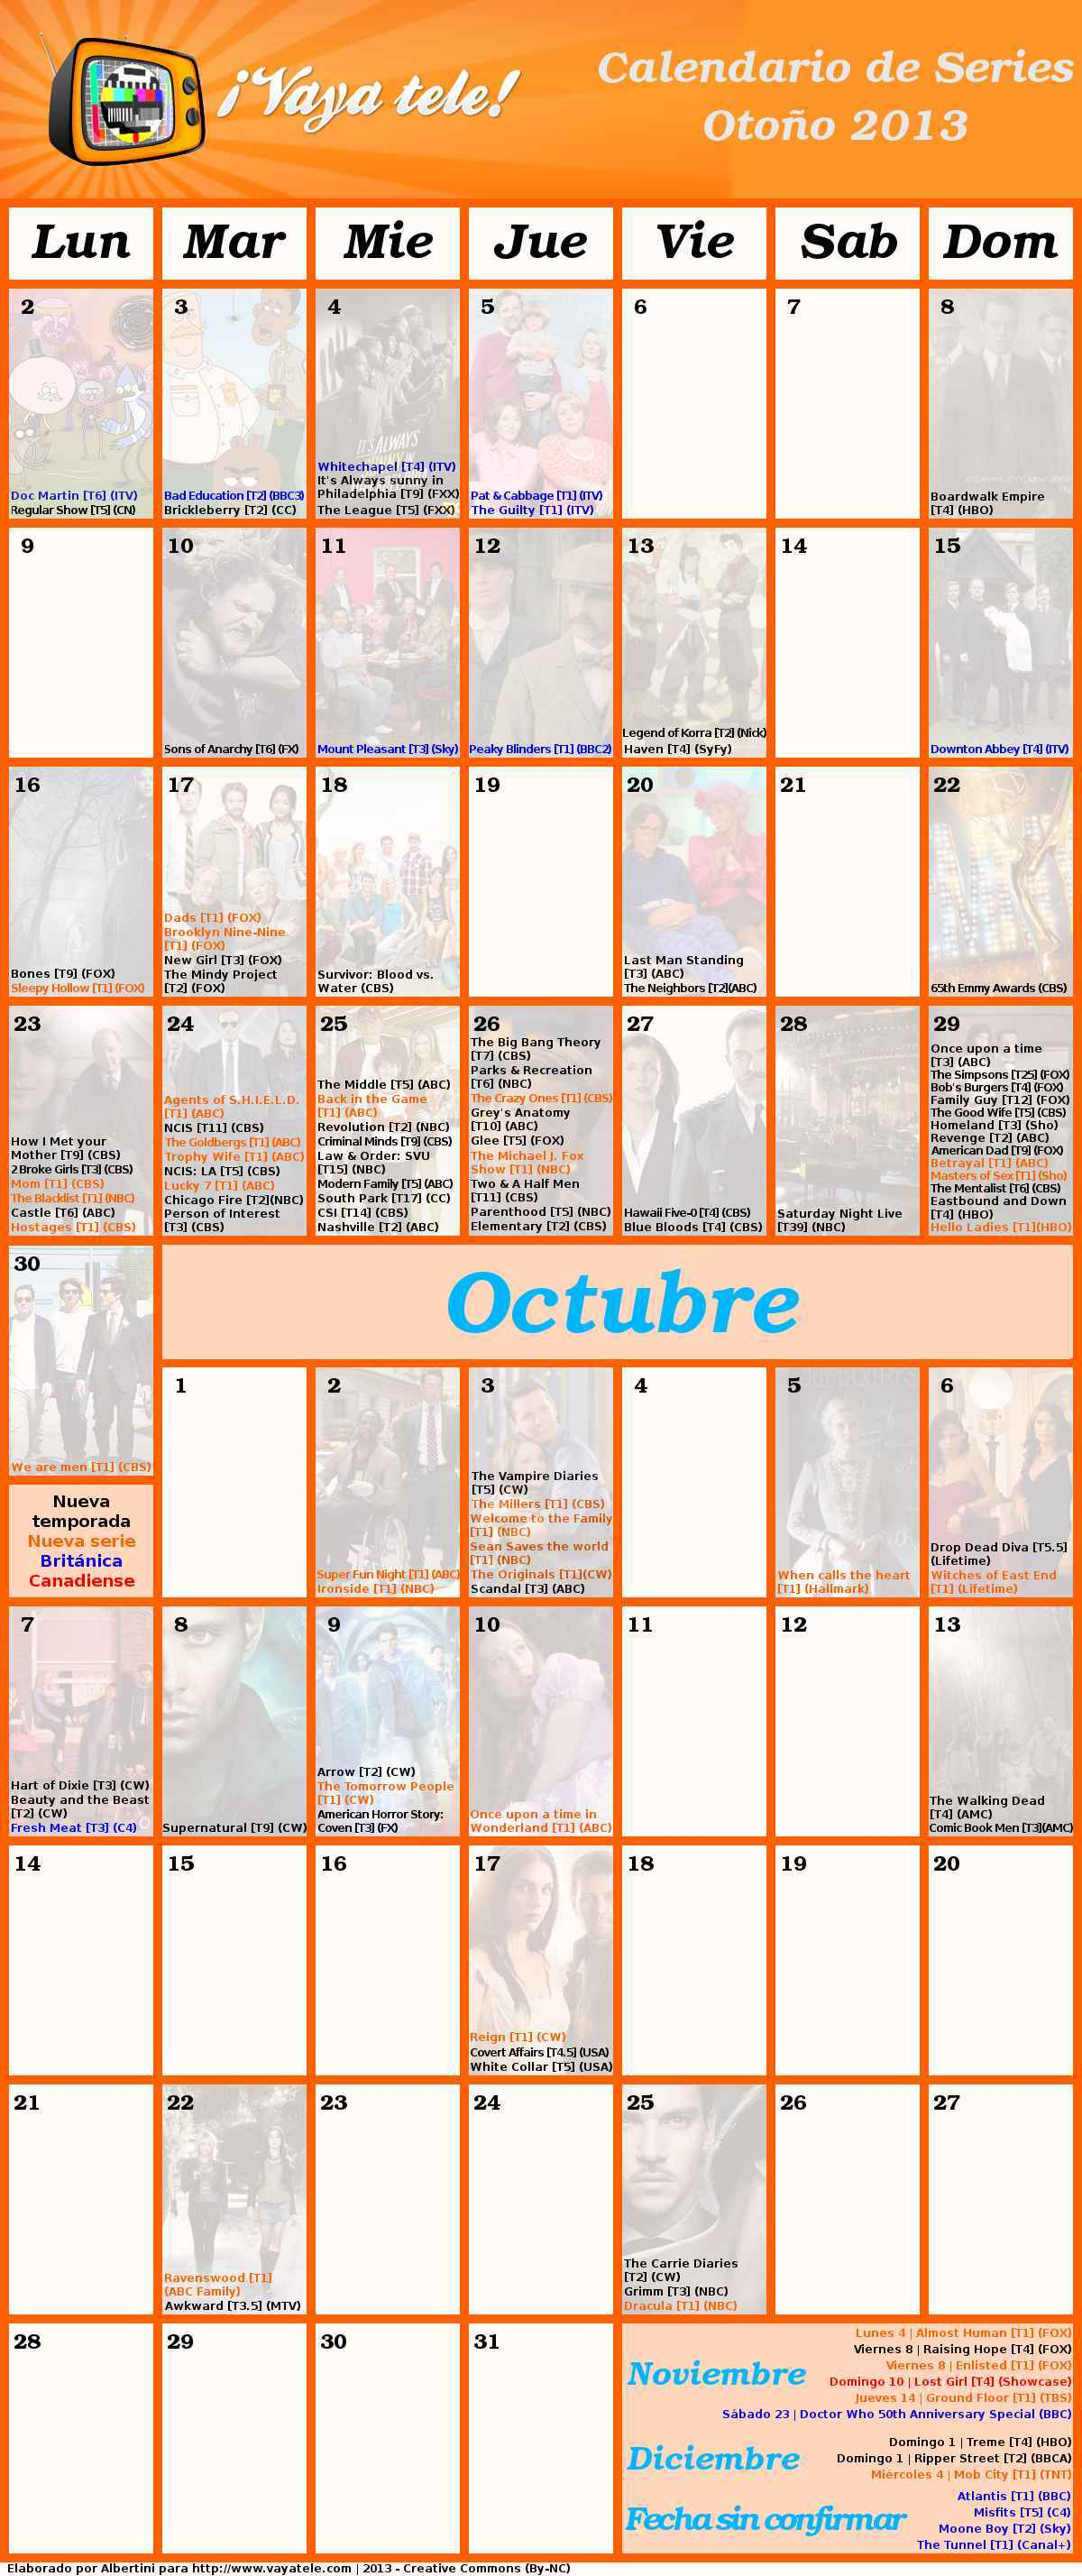 Foto de Calendario Otoño 2013 (1/2)